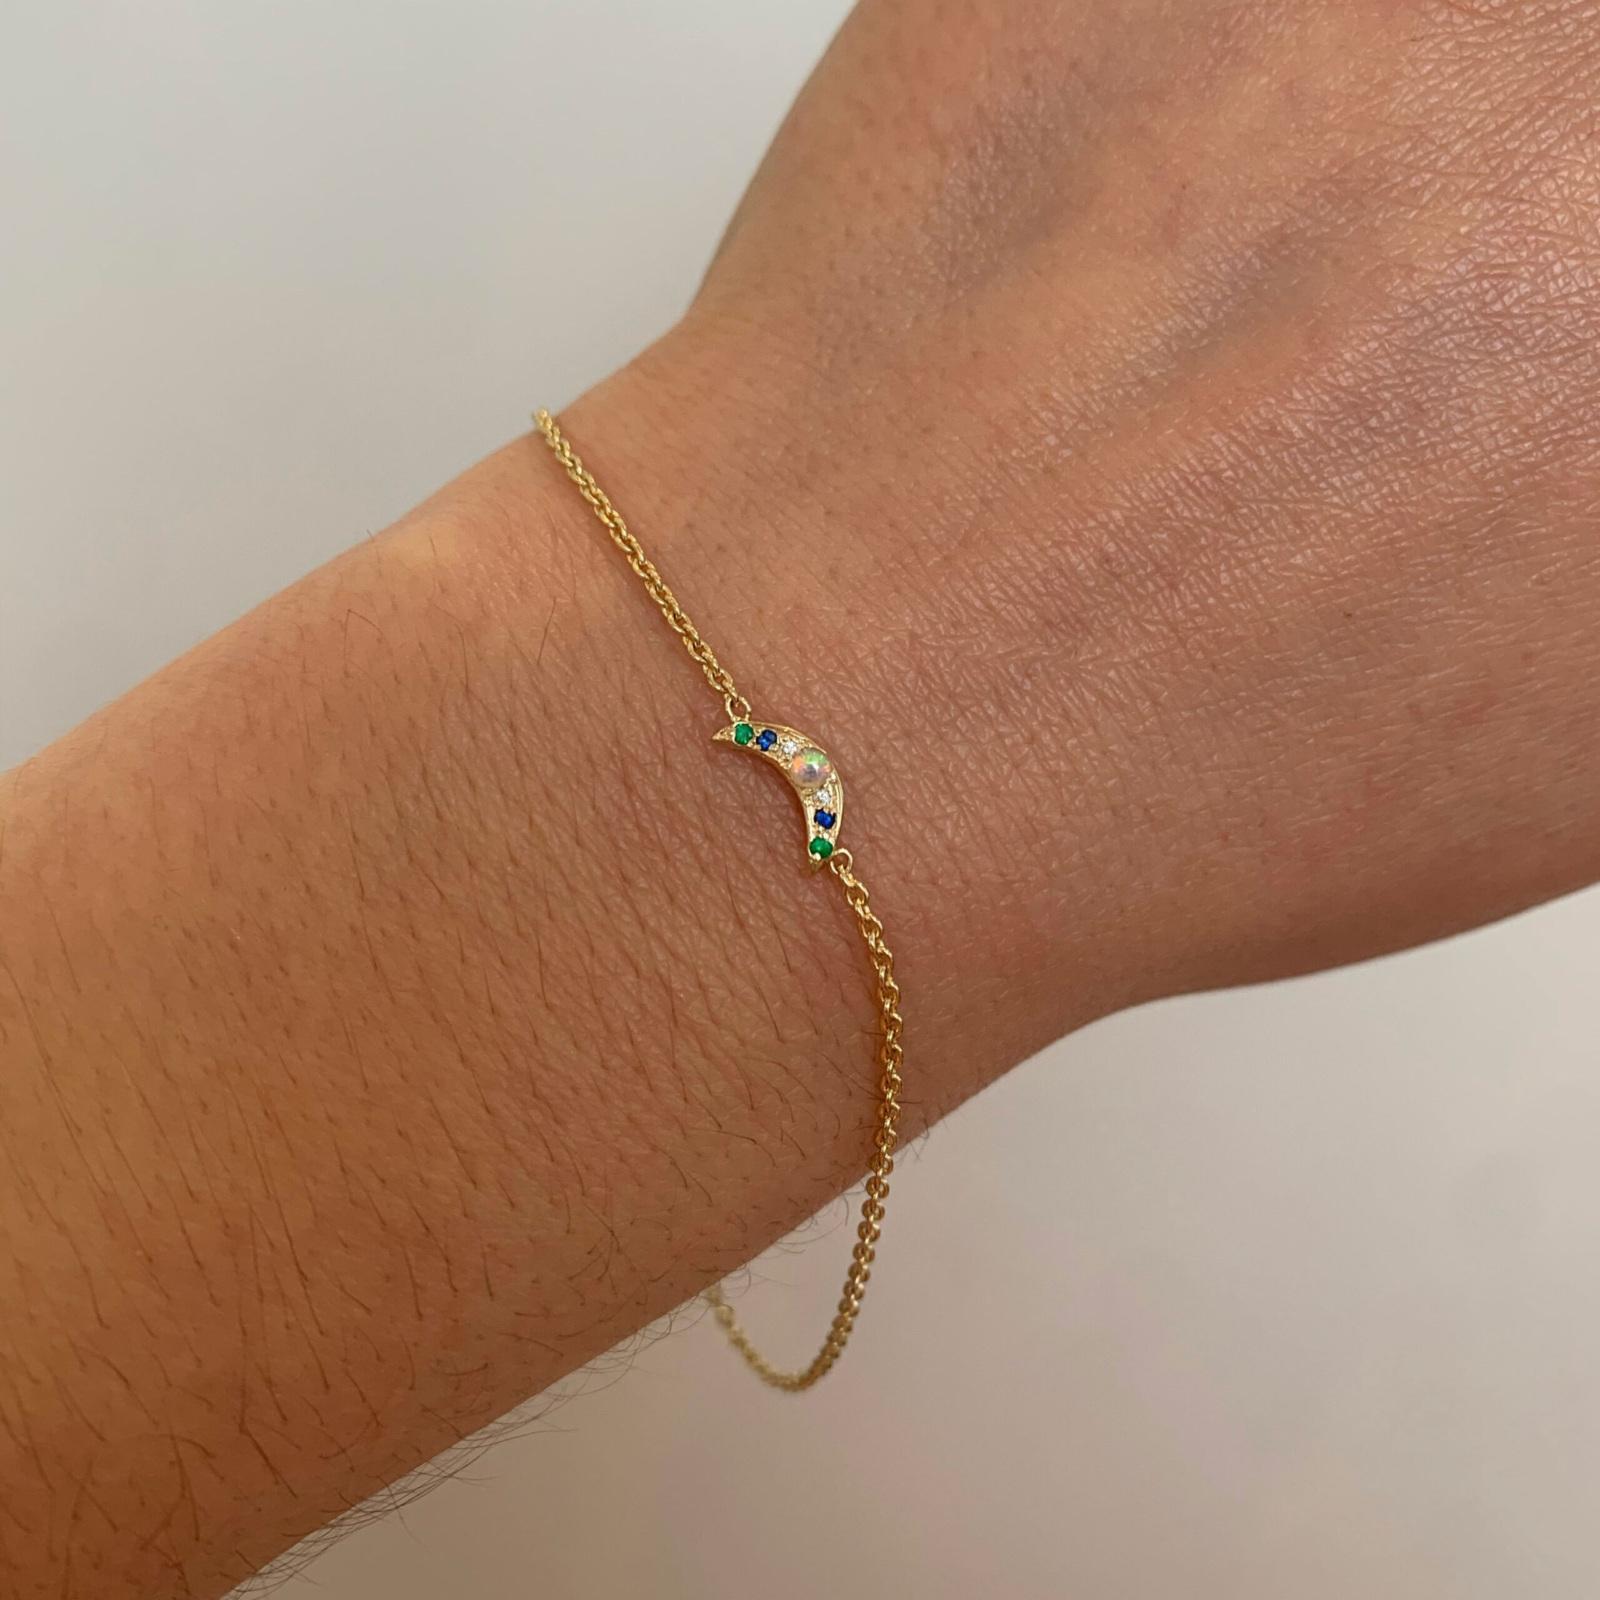 wearing the custom mini moon bracelet